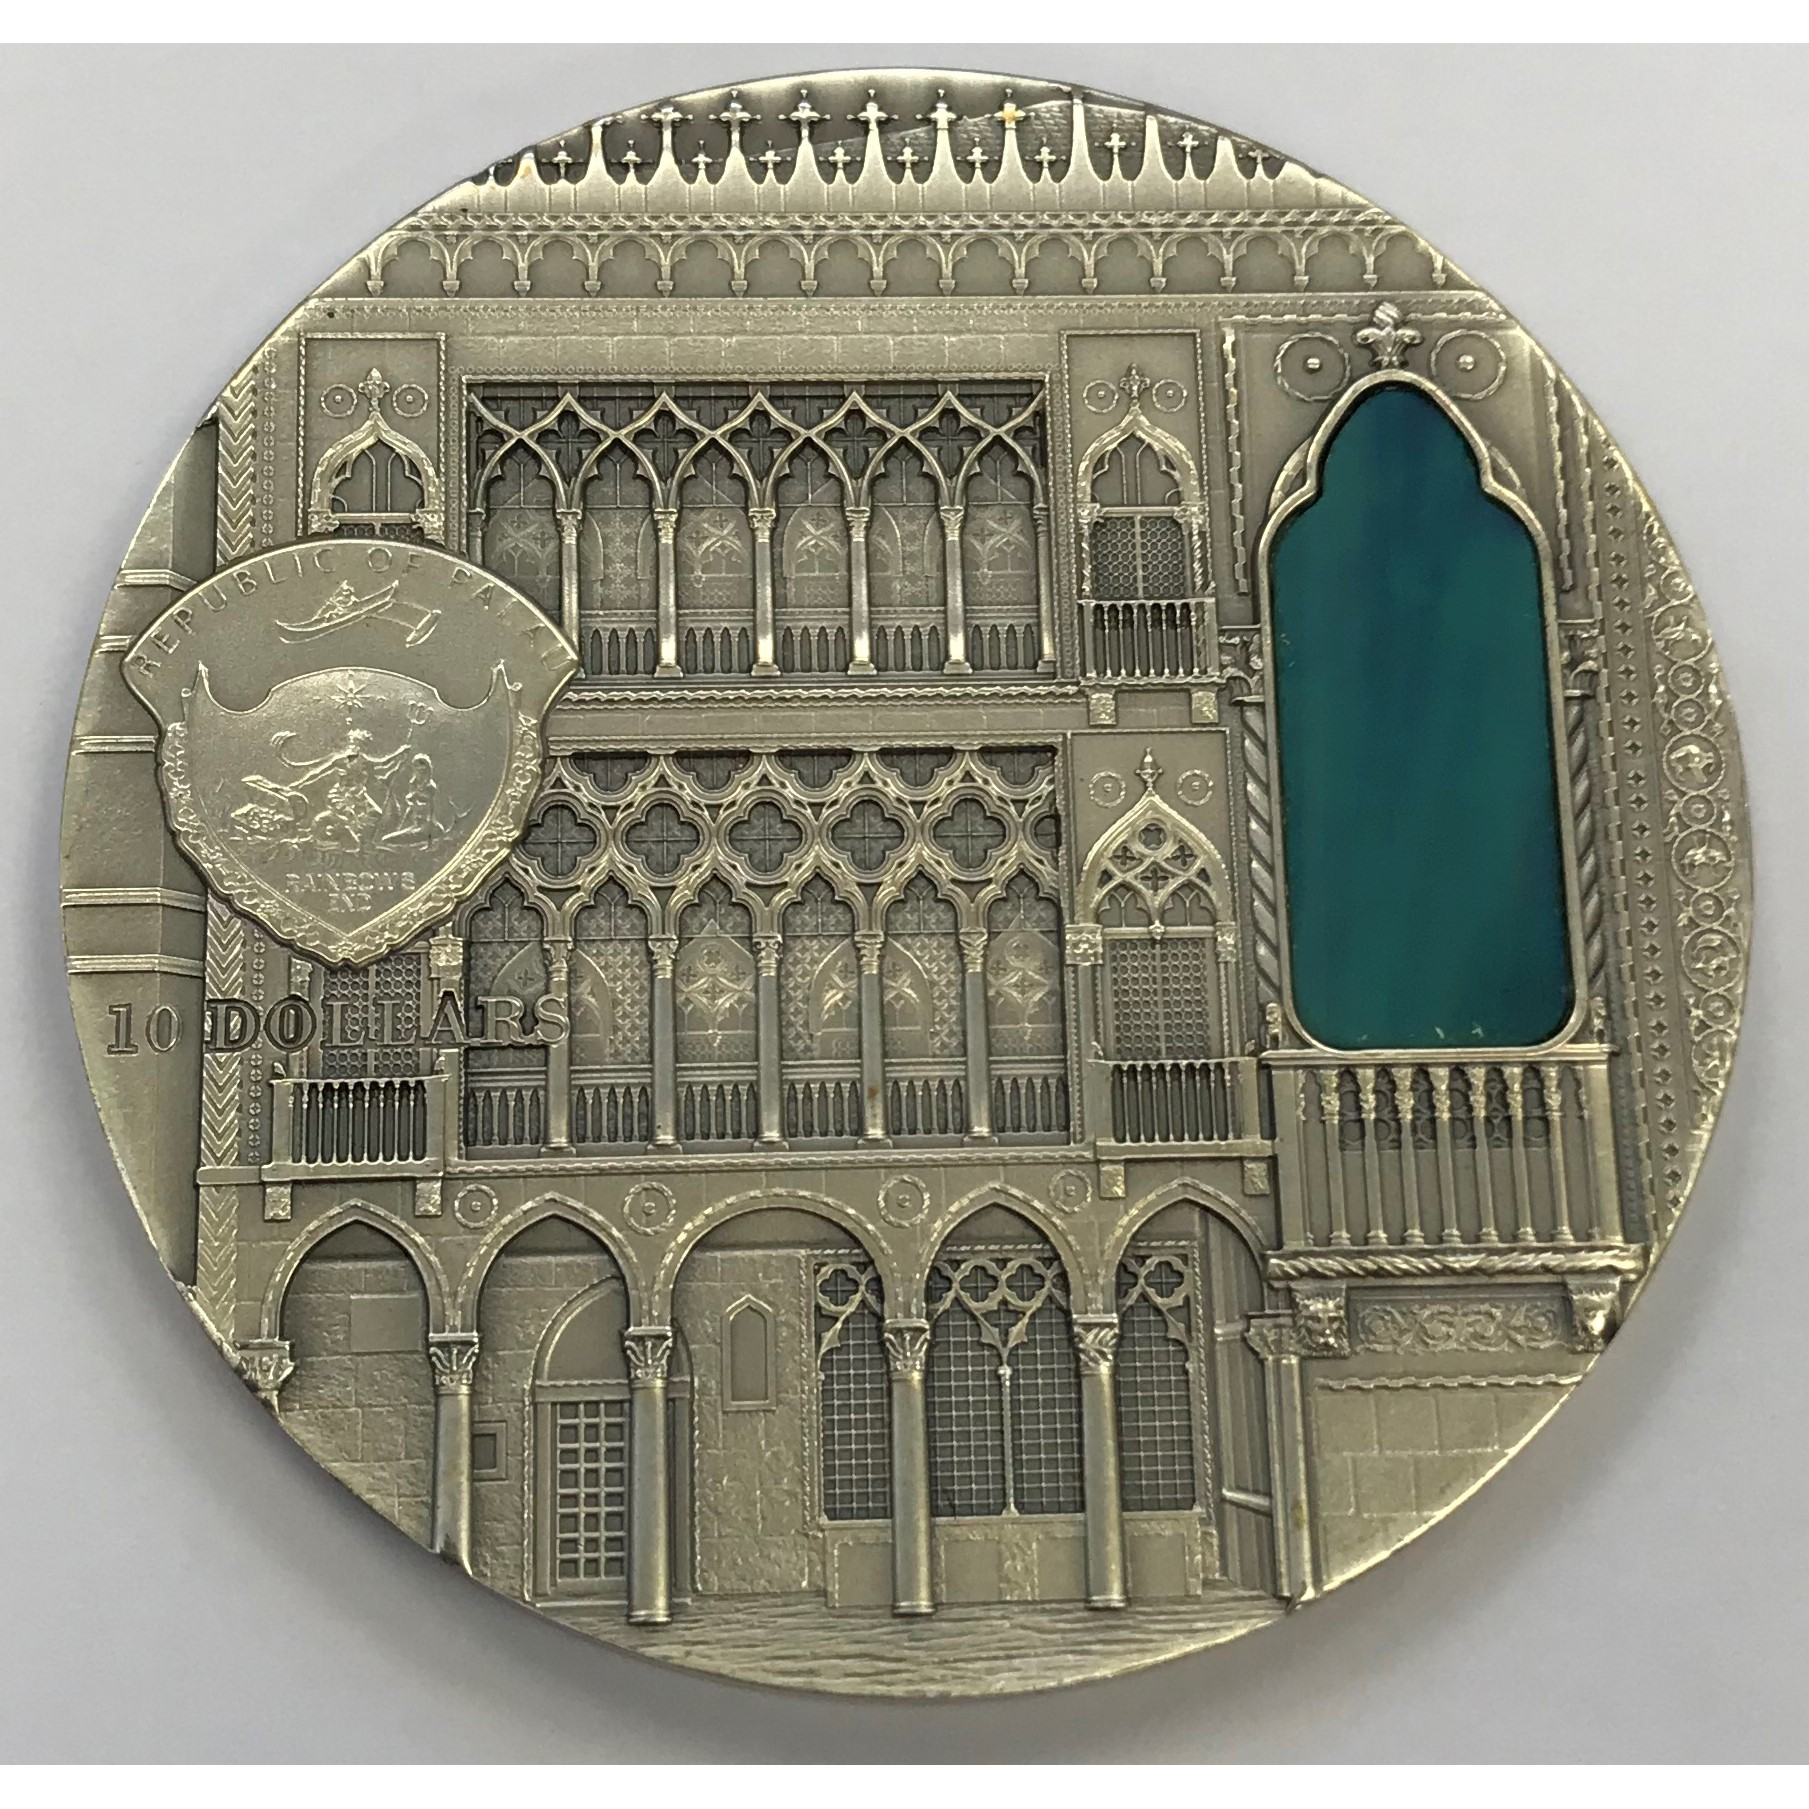 Moneda Palaos 10 Dollars Venetian Gothic Plata 2 oz